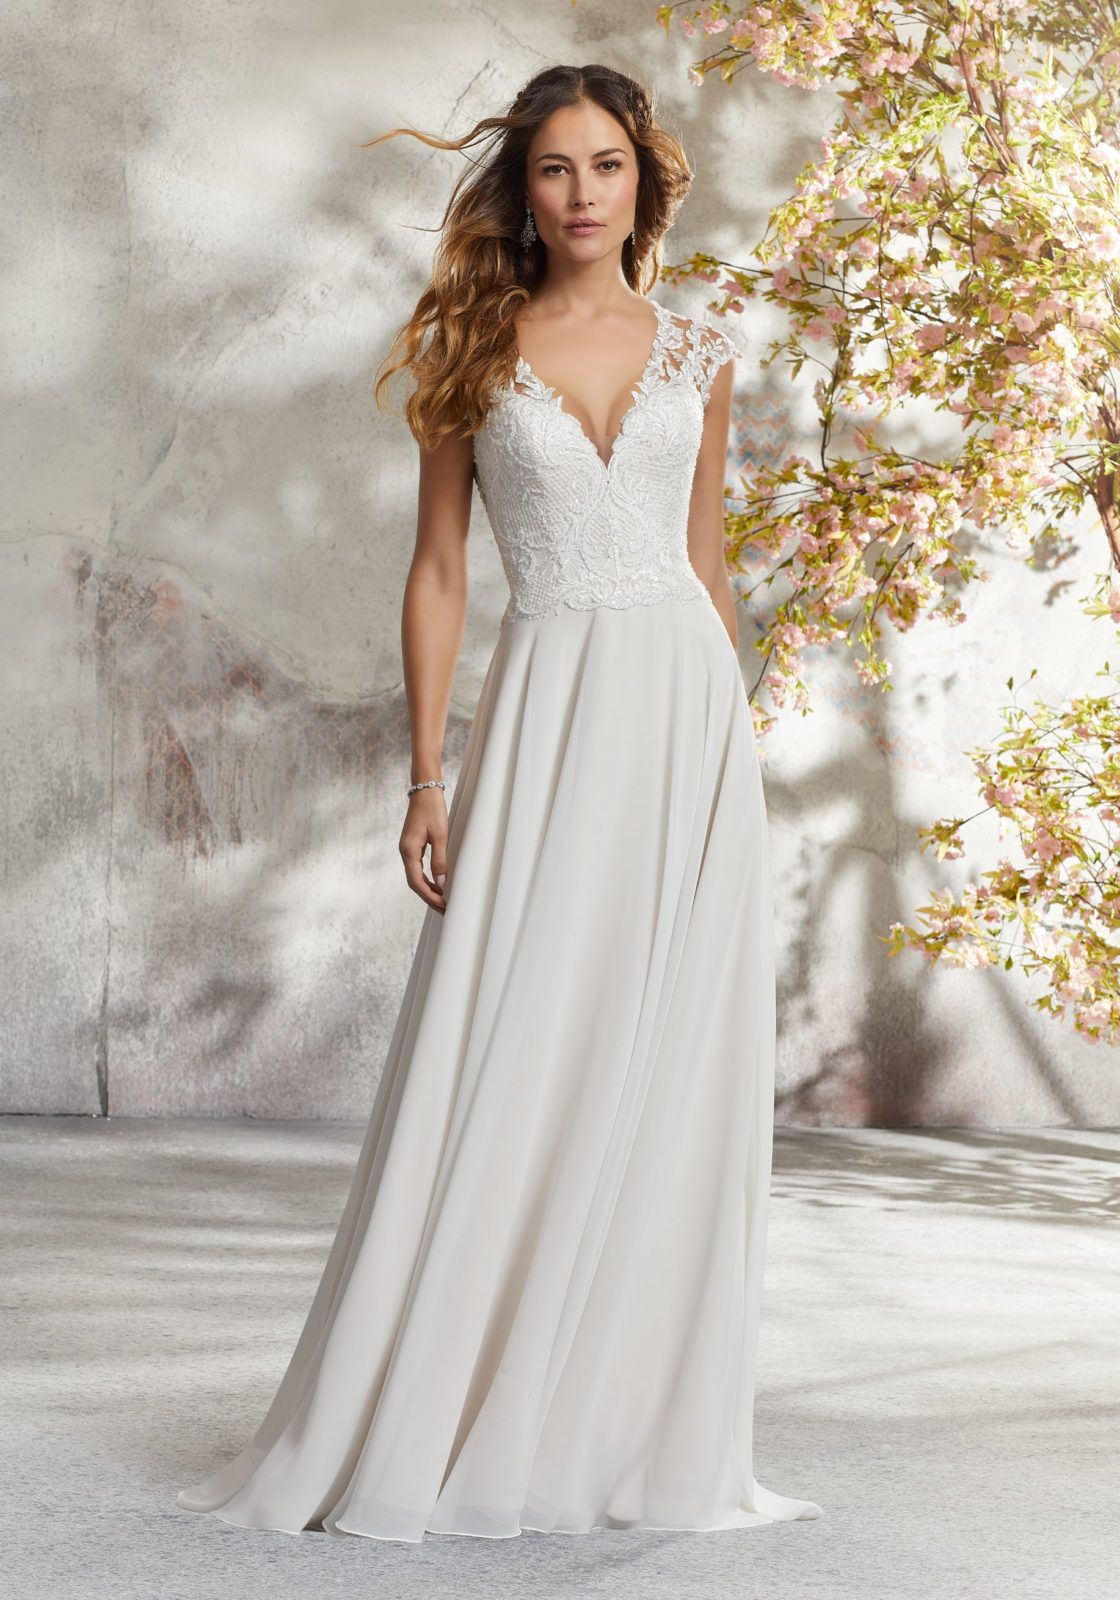 Lark Wedding Dress Morilee Second Wedding Dresses Ivory Wedding Dress A Line Wedding Dress